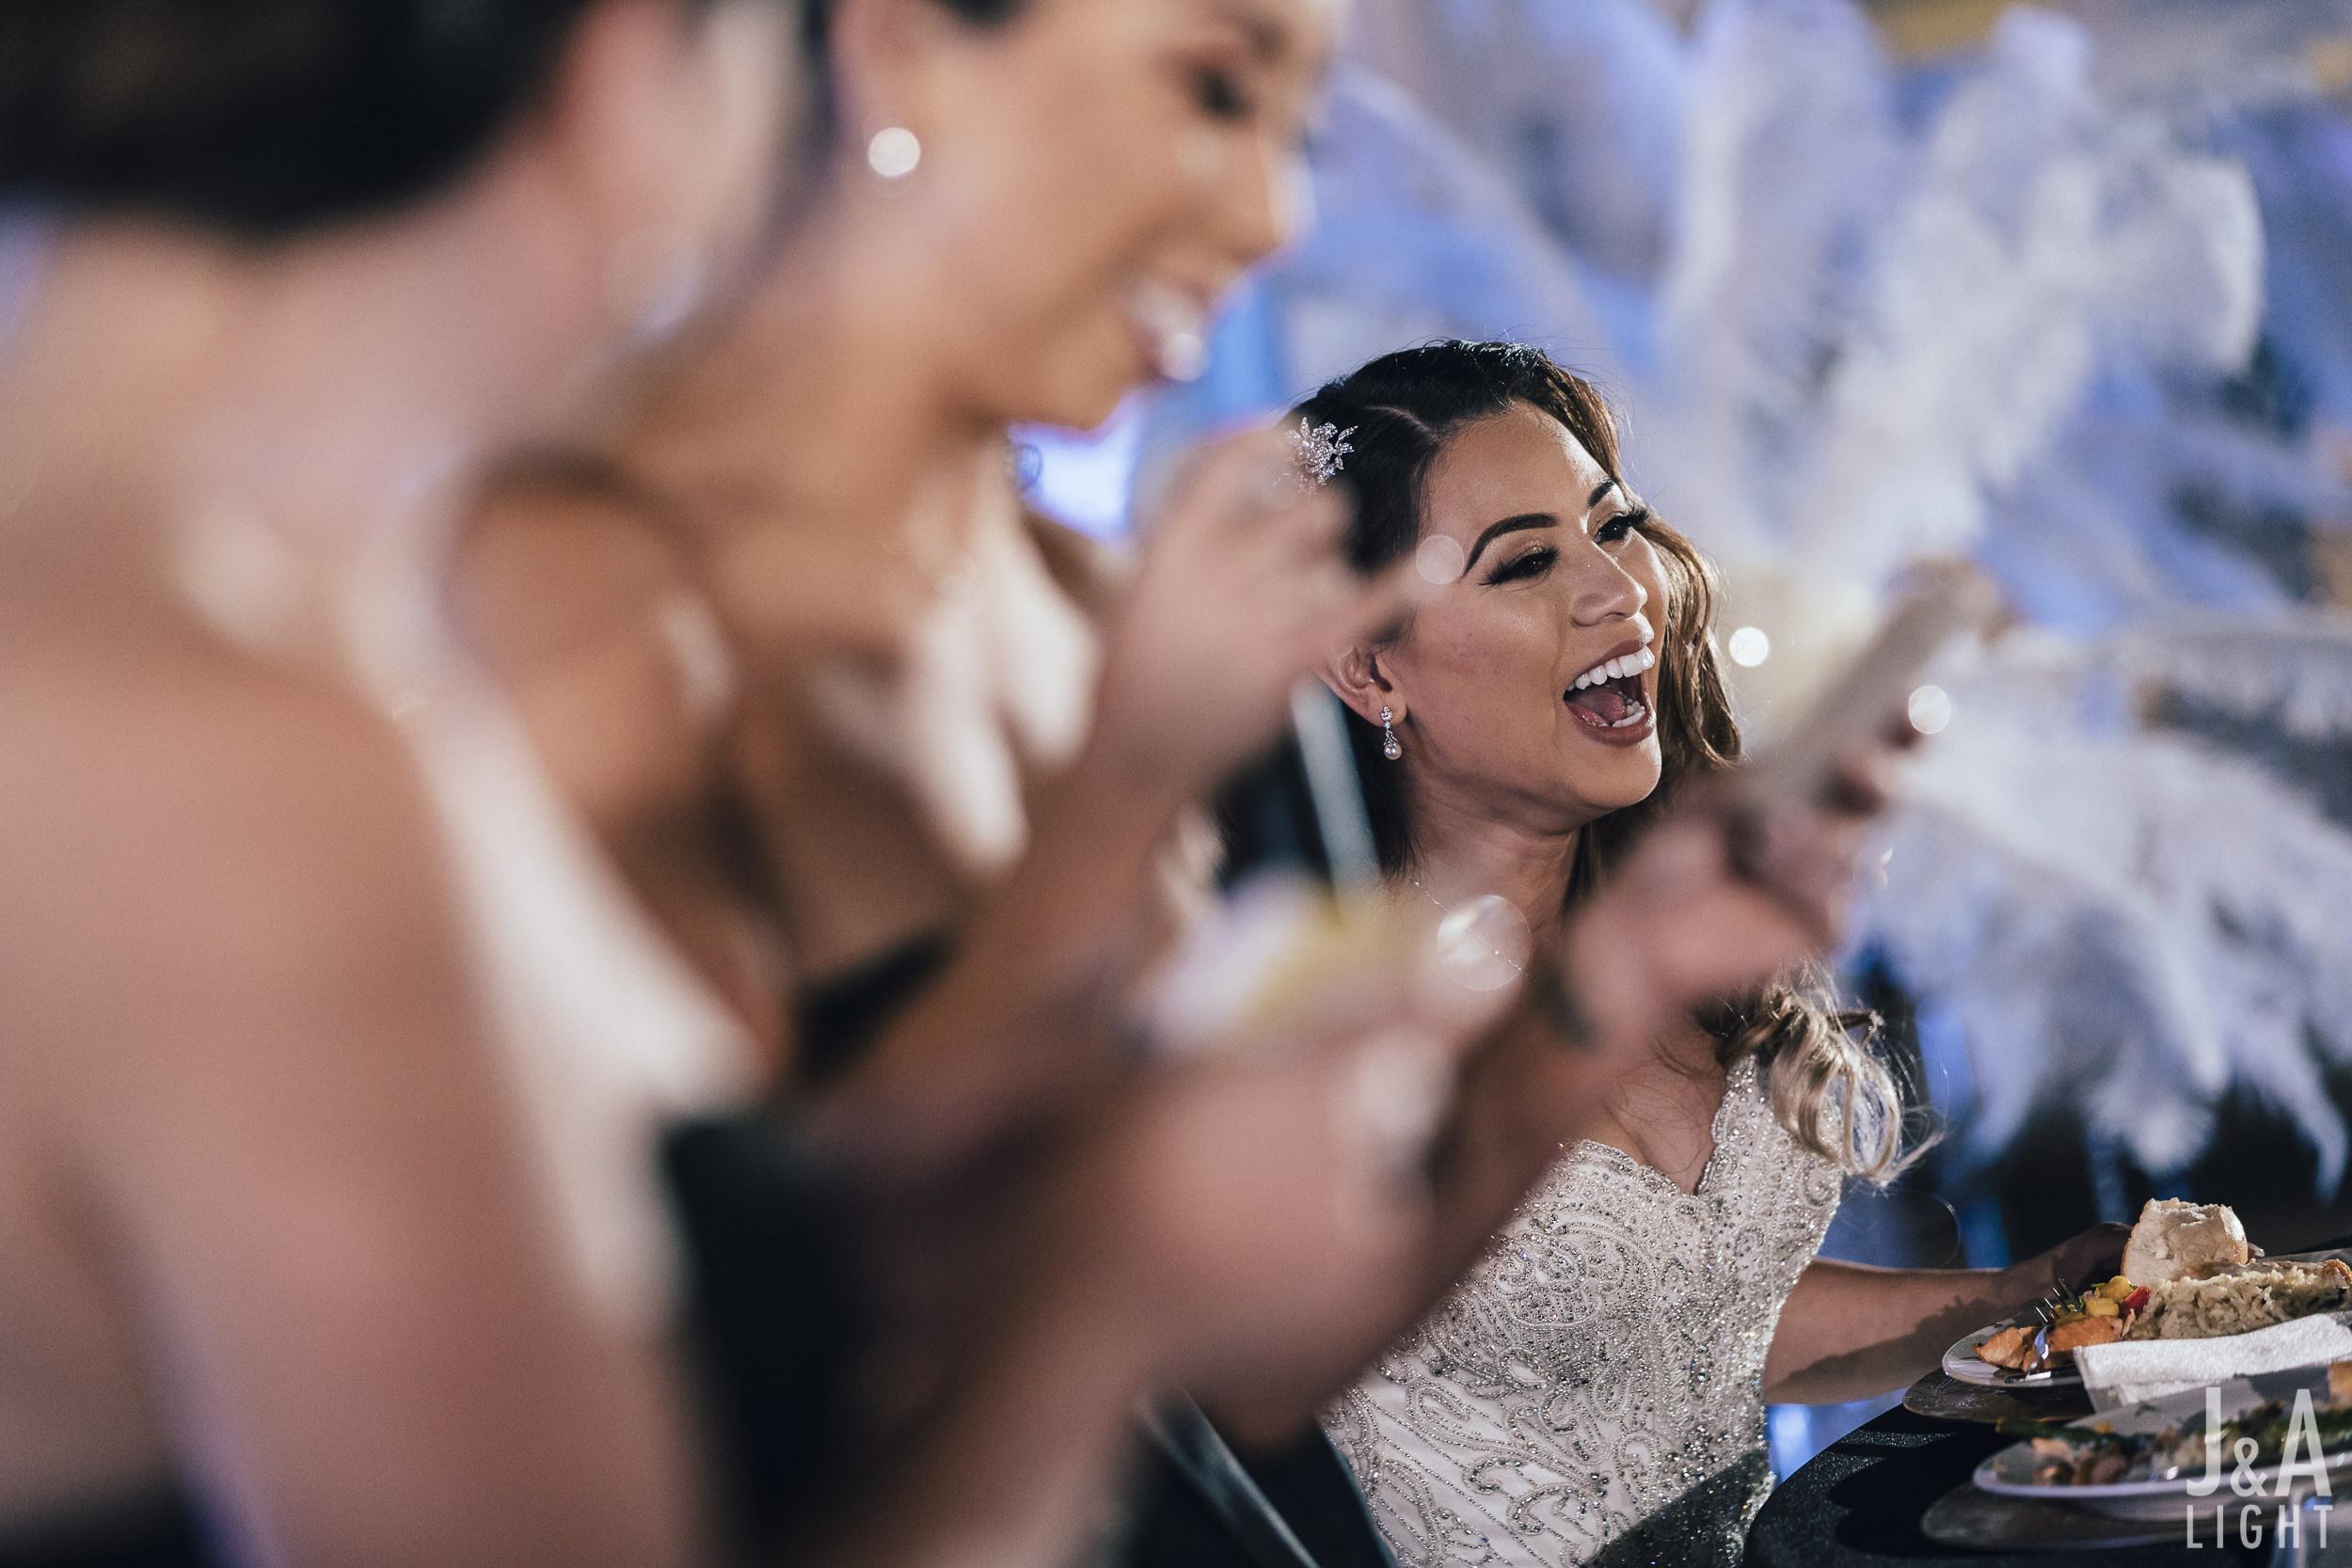 20171014-JanDan-LosBanos-GlassMansion-Wedding-Blog-072.jpg